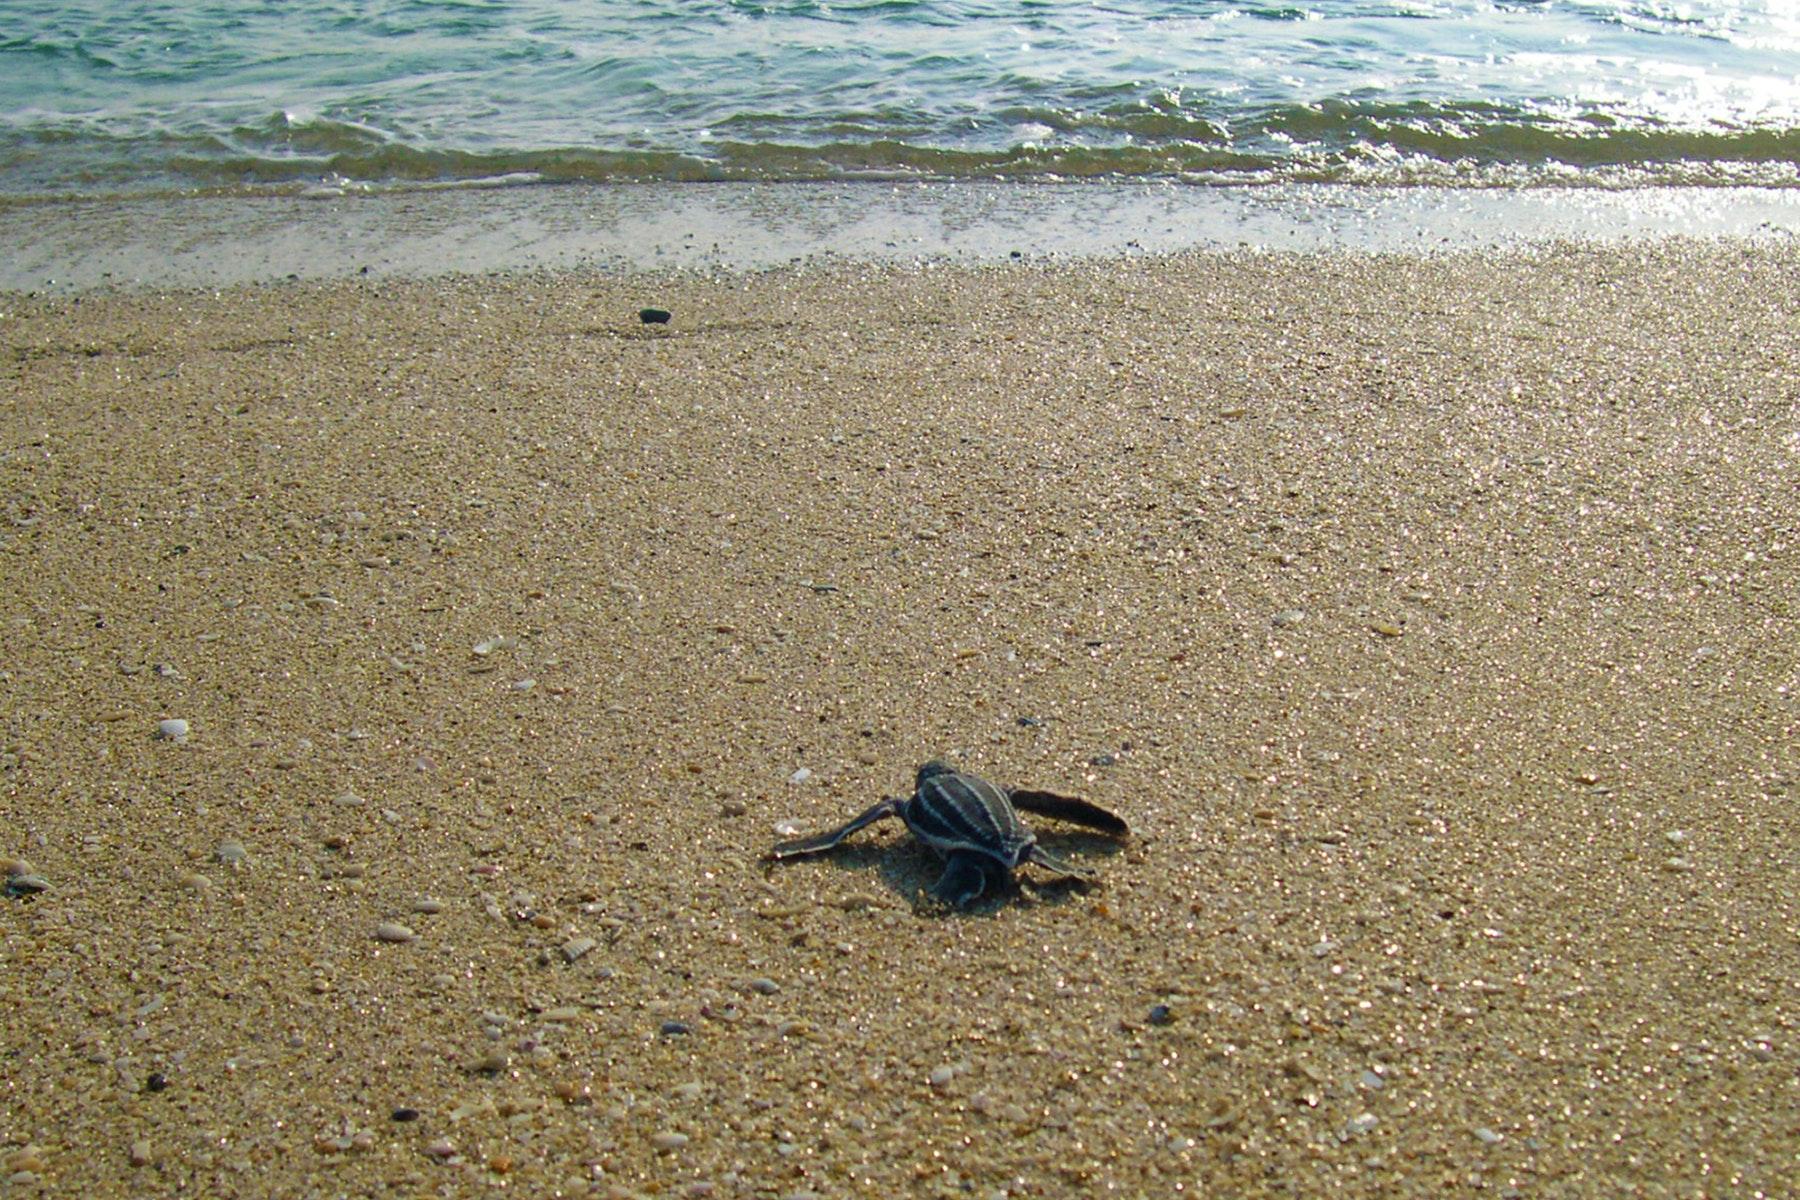 leatherback sea turtle hatchling on beach headed to ocean